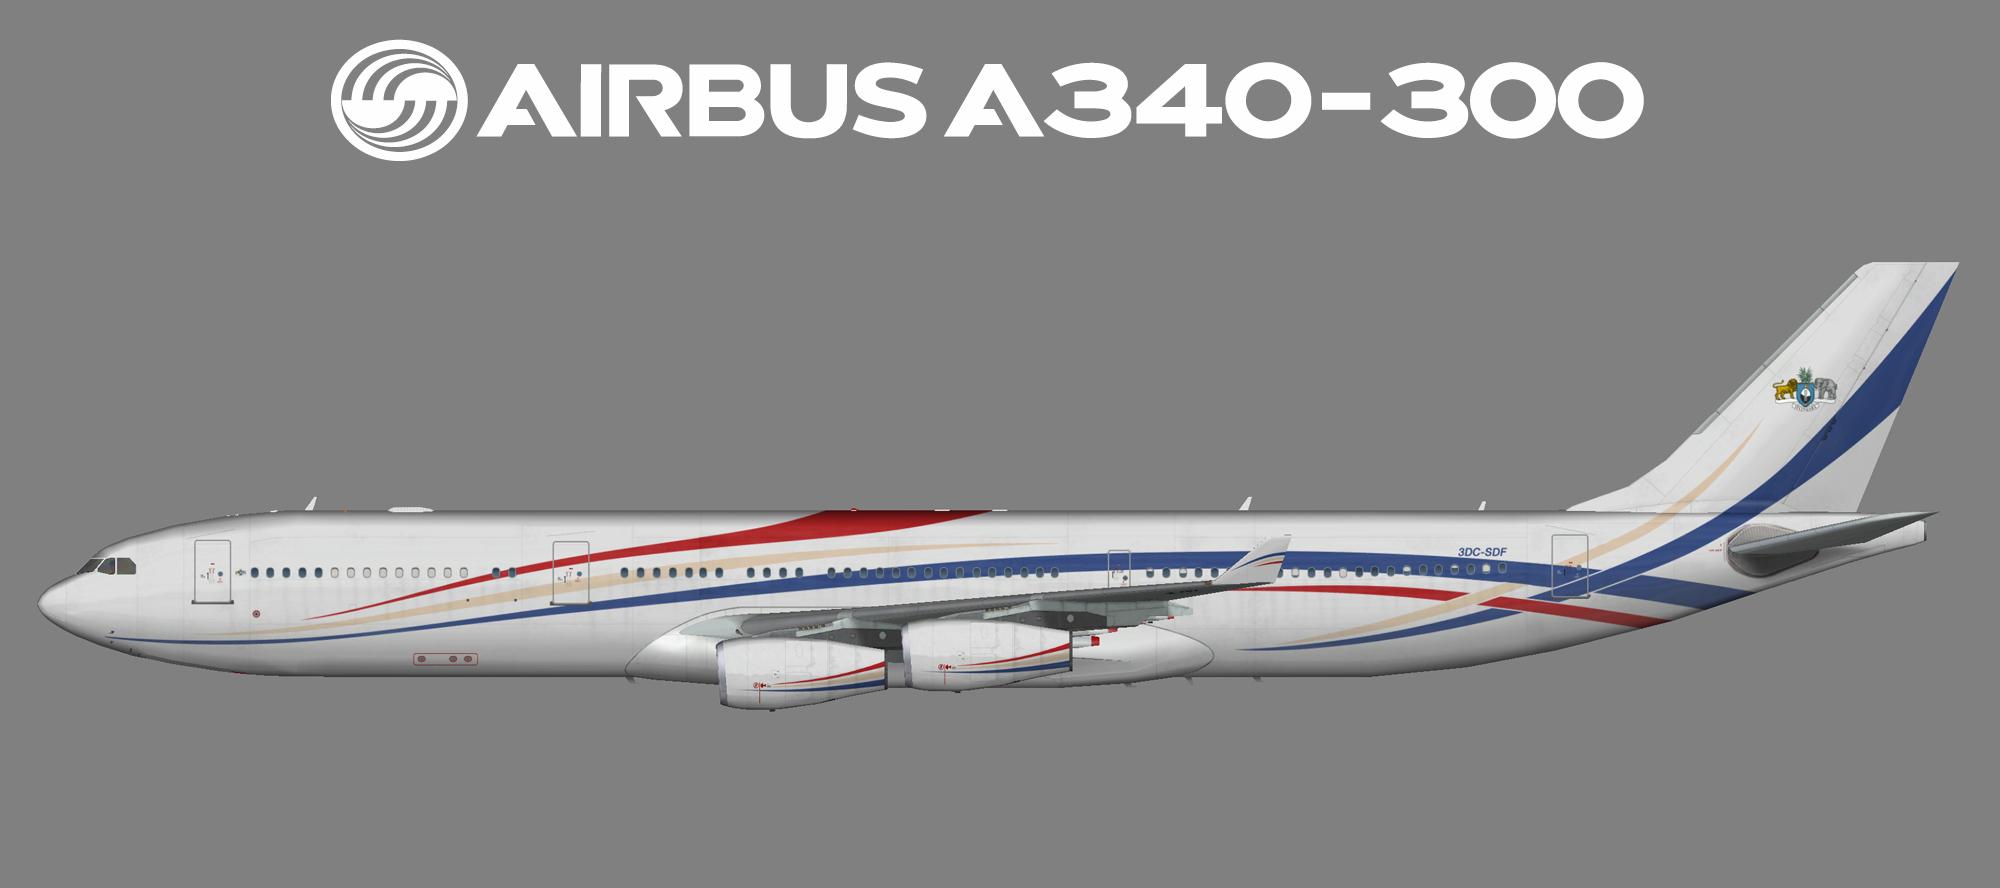 Kingdom of Eswatini Airbus A340-300